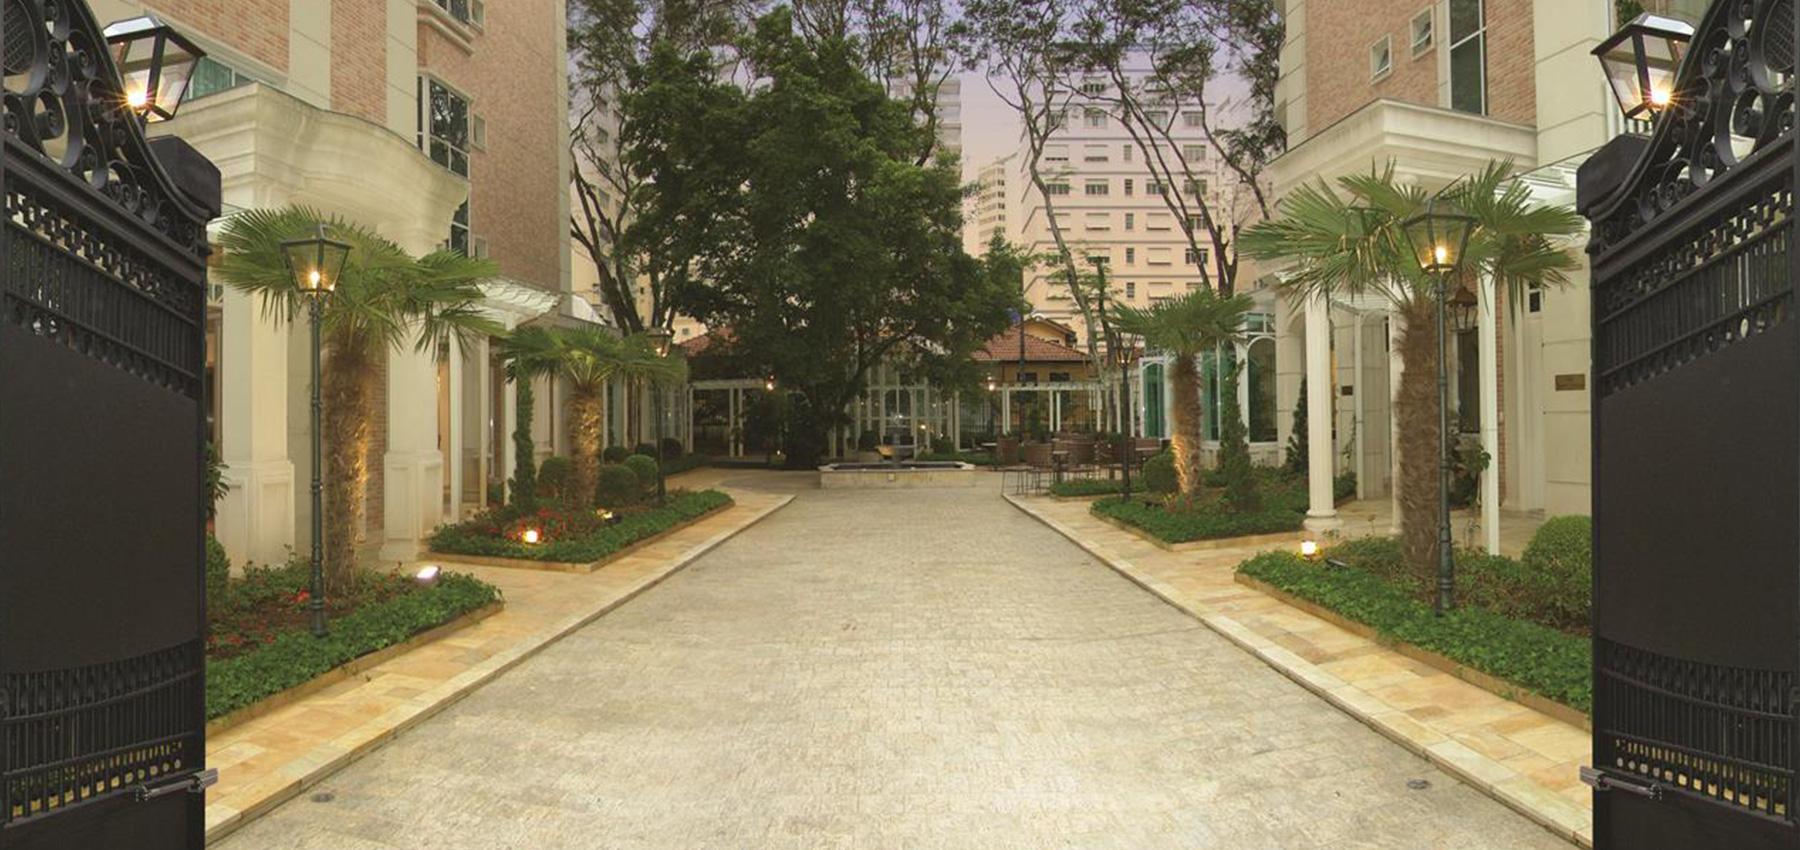 Estanconfor<br>Villa Jardins